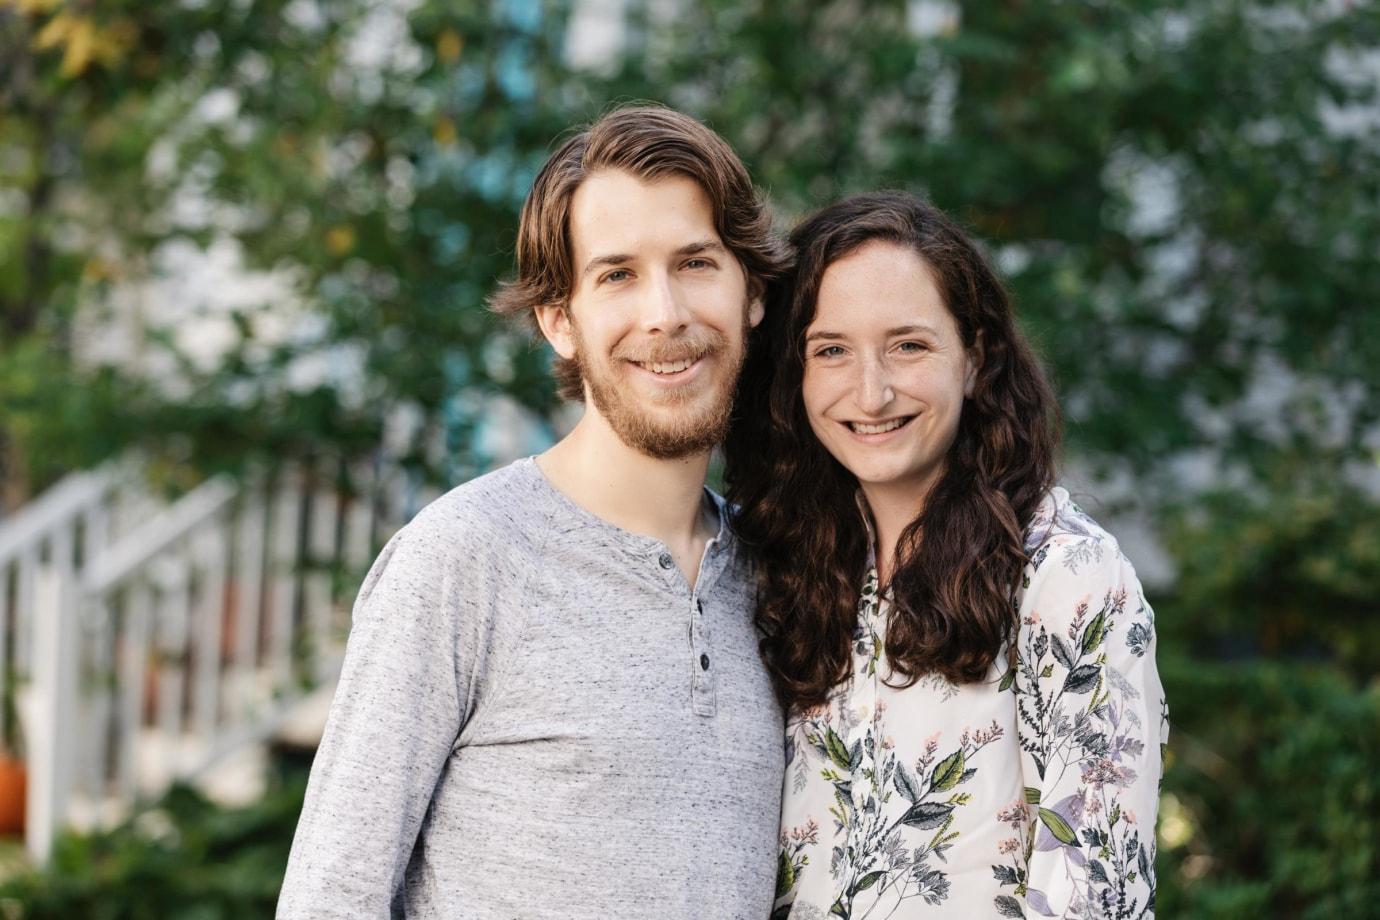 Daniel Barson and Abigail Greene